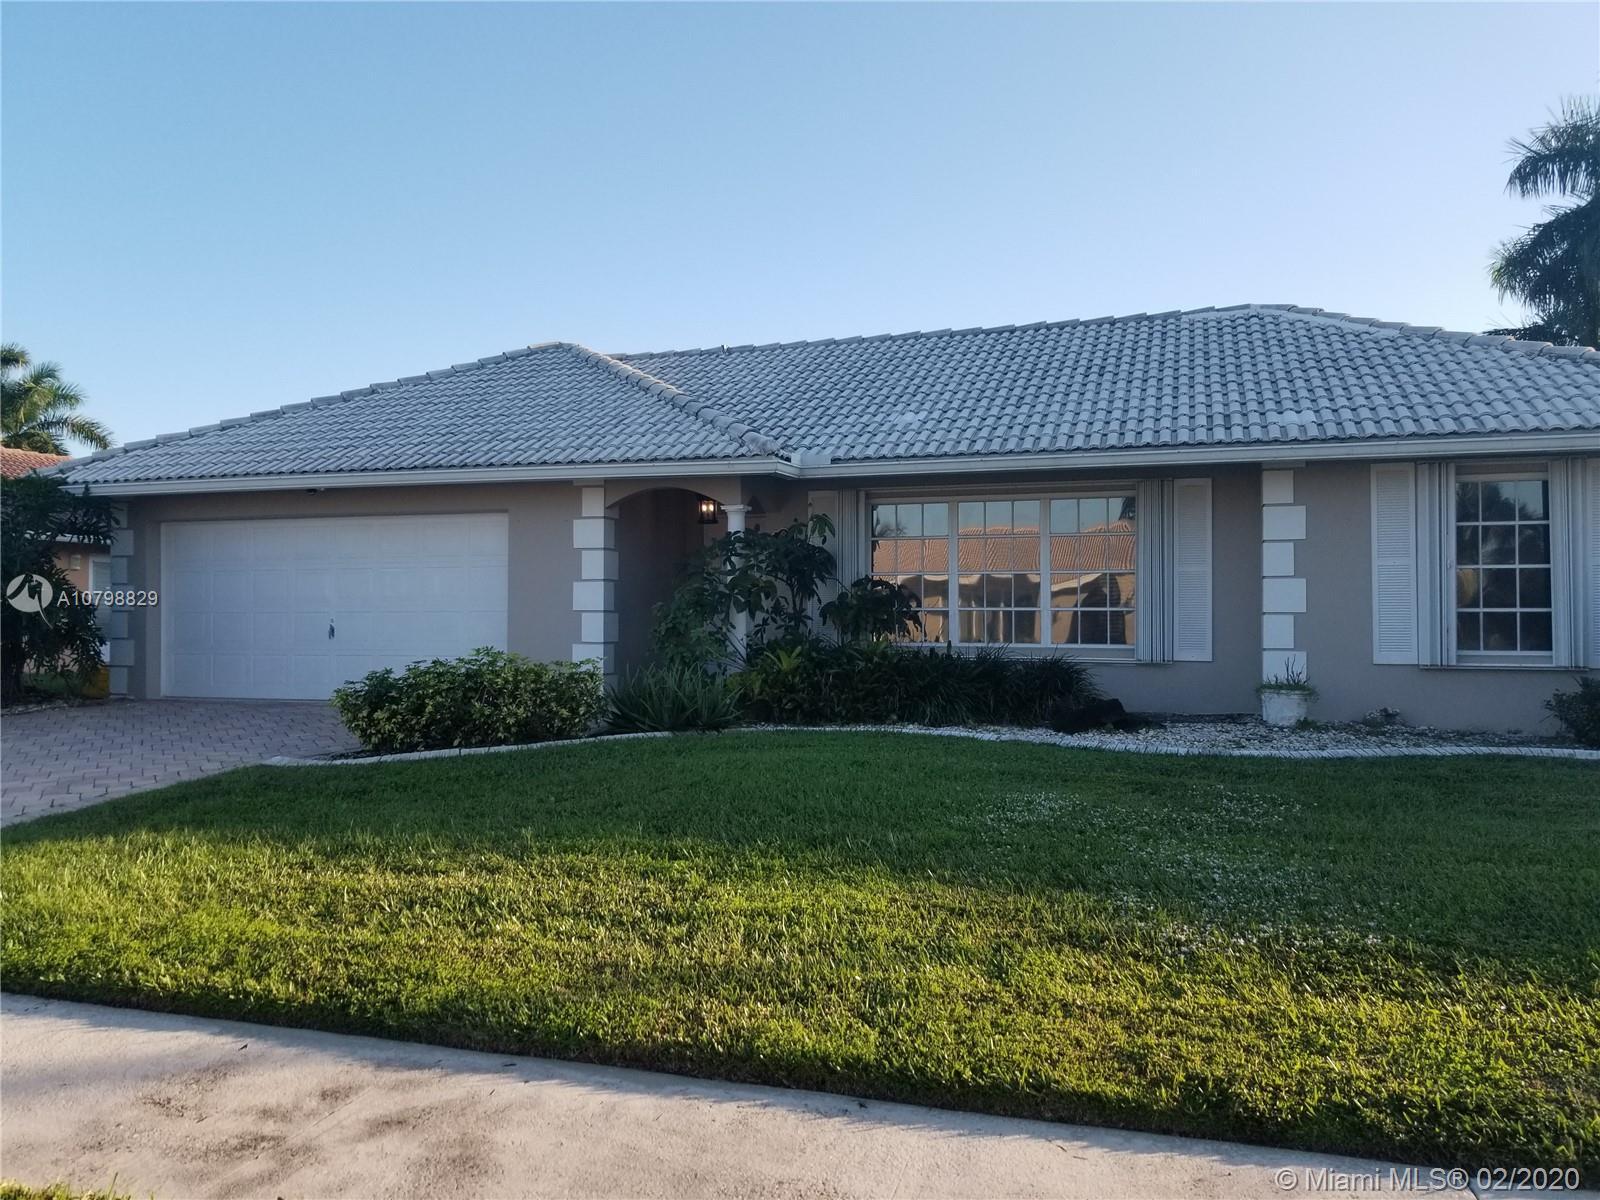 5665 Golfway Dr, Boca Raton, FL 33433